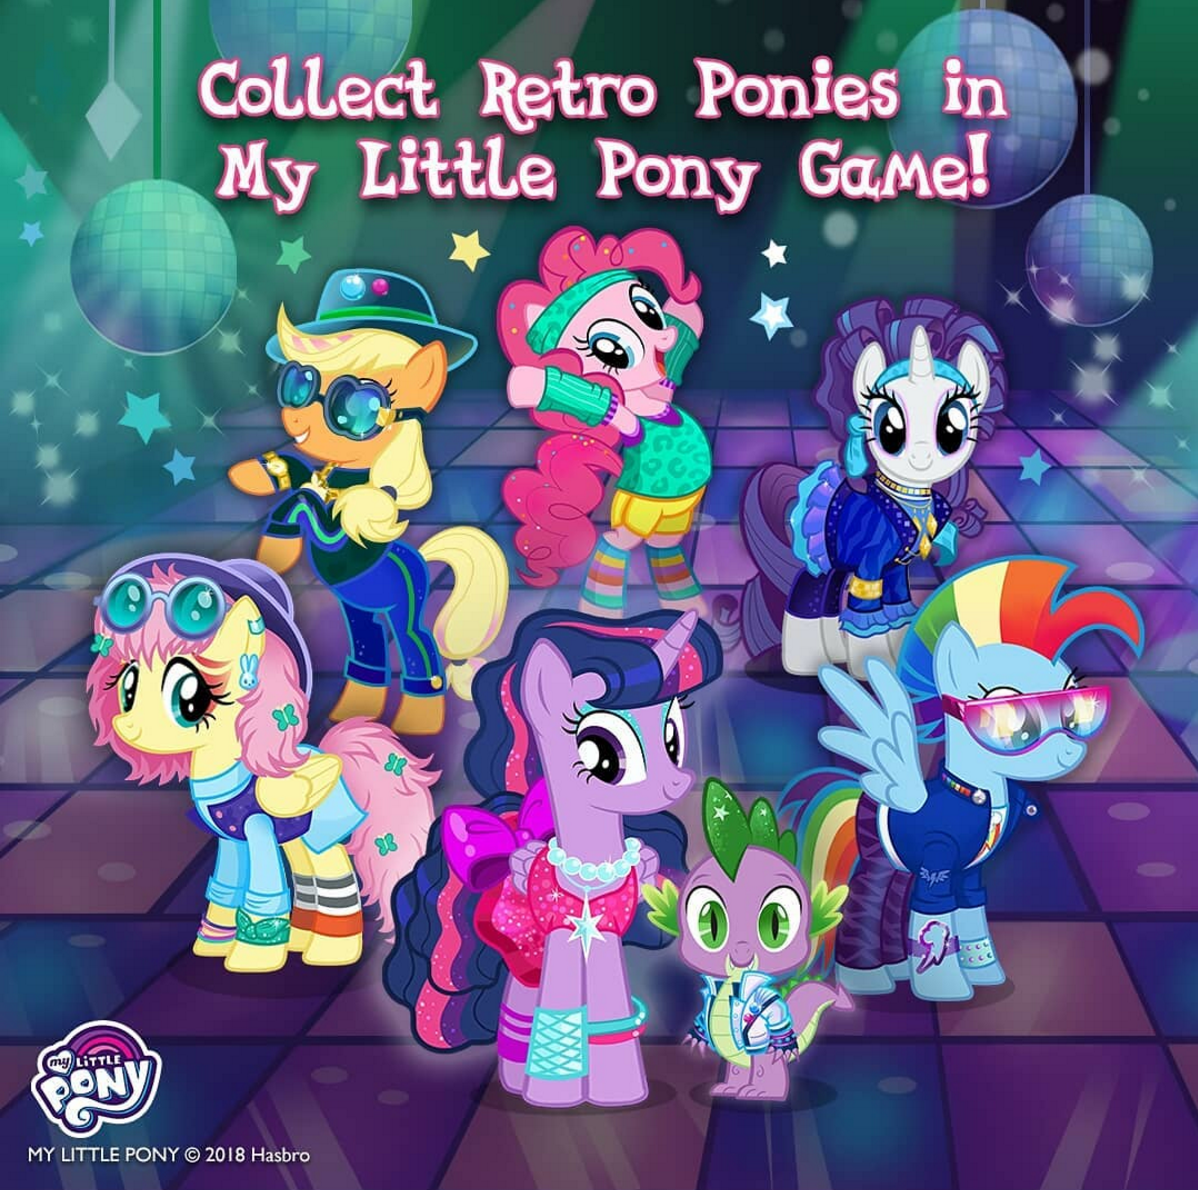 My little pony established 1983 my little pony - My little pony wikia ...